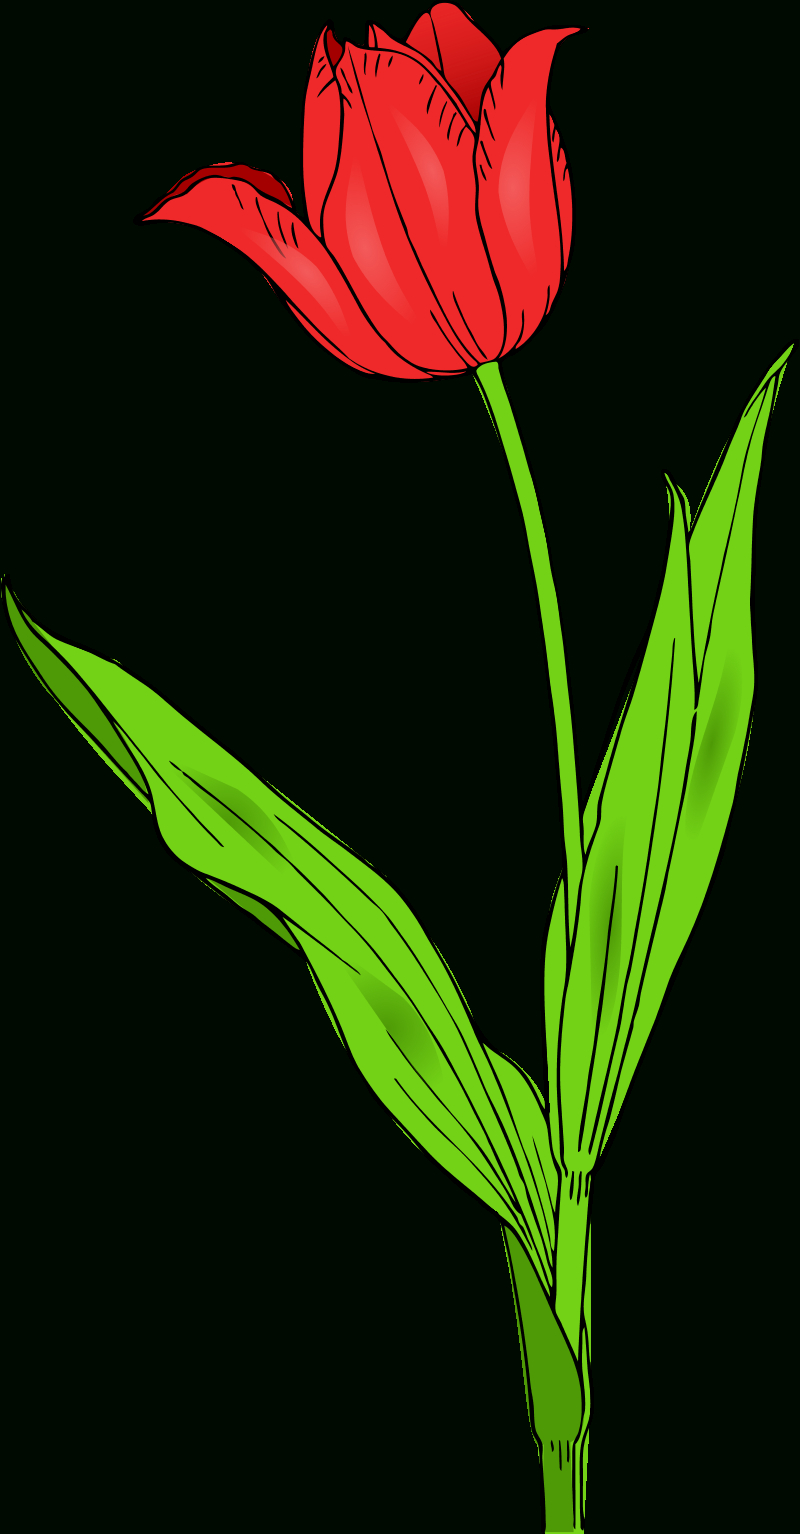 Spring Flowers Clip Art Free Printable 3 - Cliparting - Free Printable Clip Art Flowers